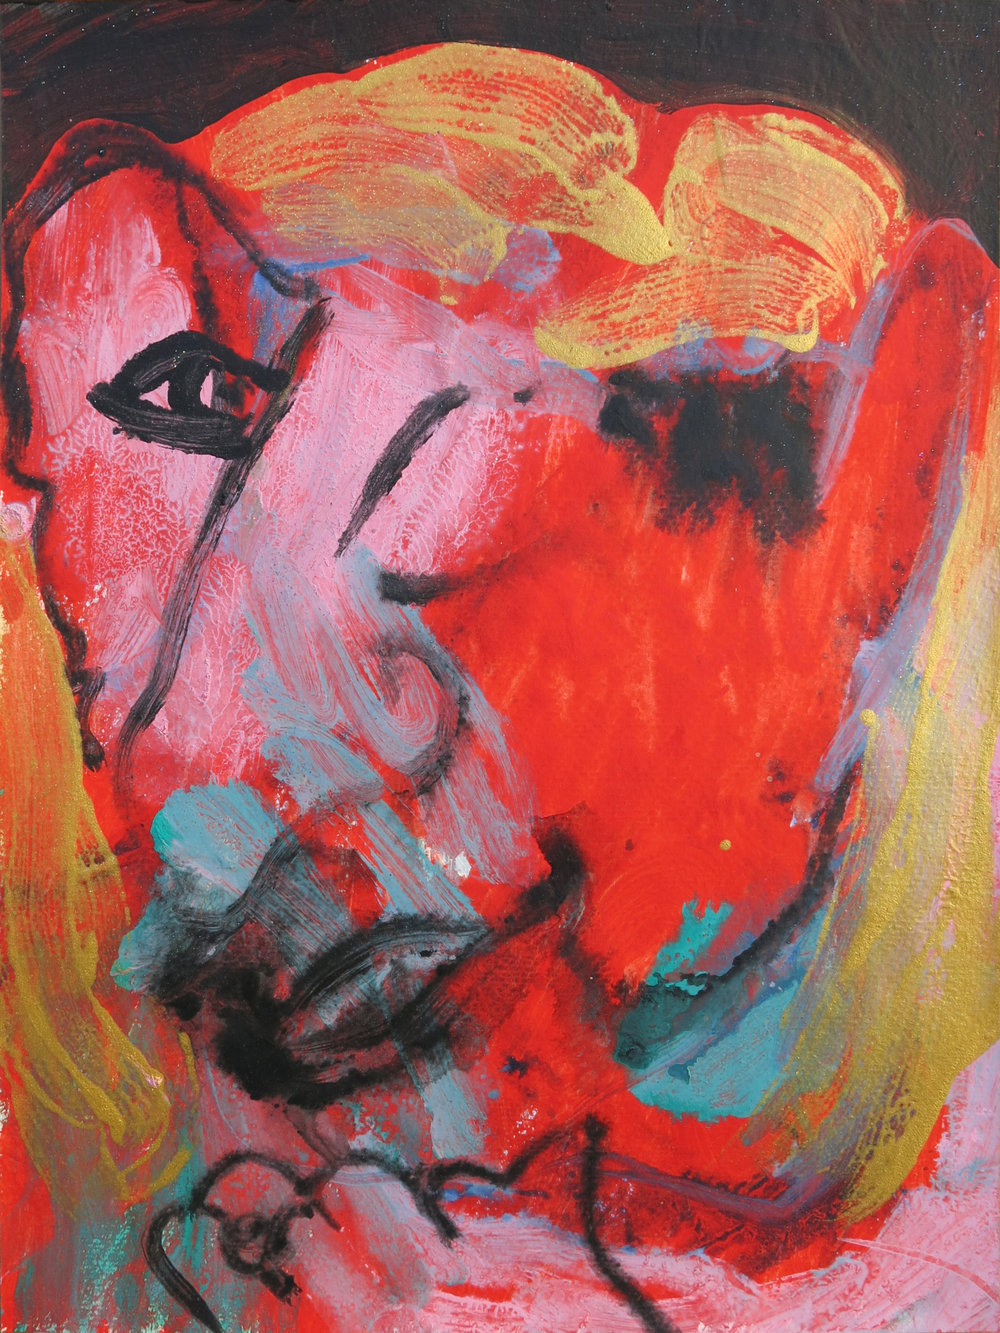 Barbra Streisand Portrait #40